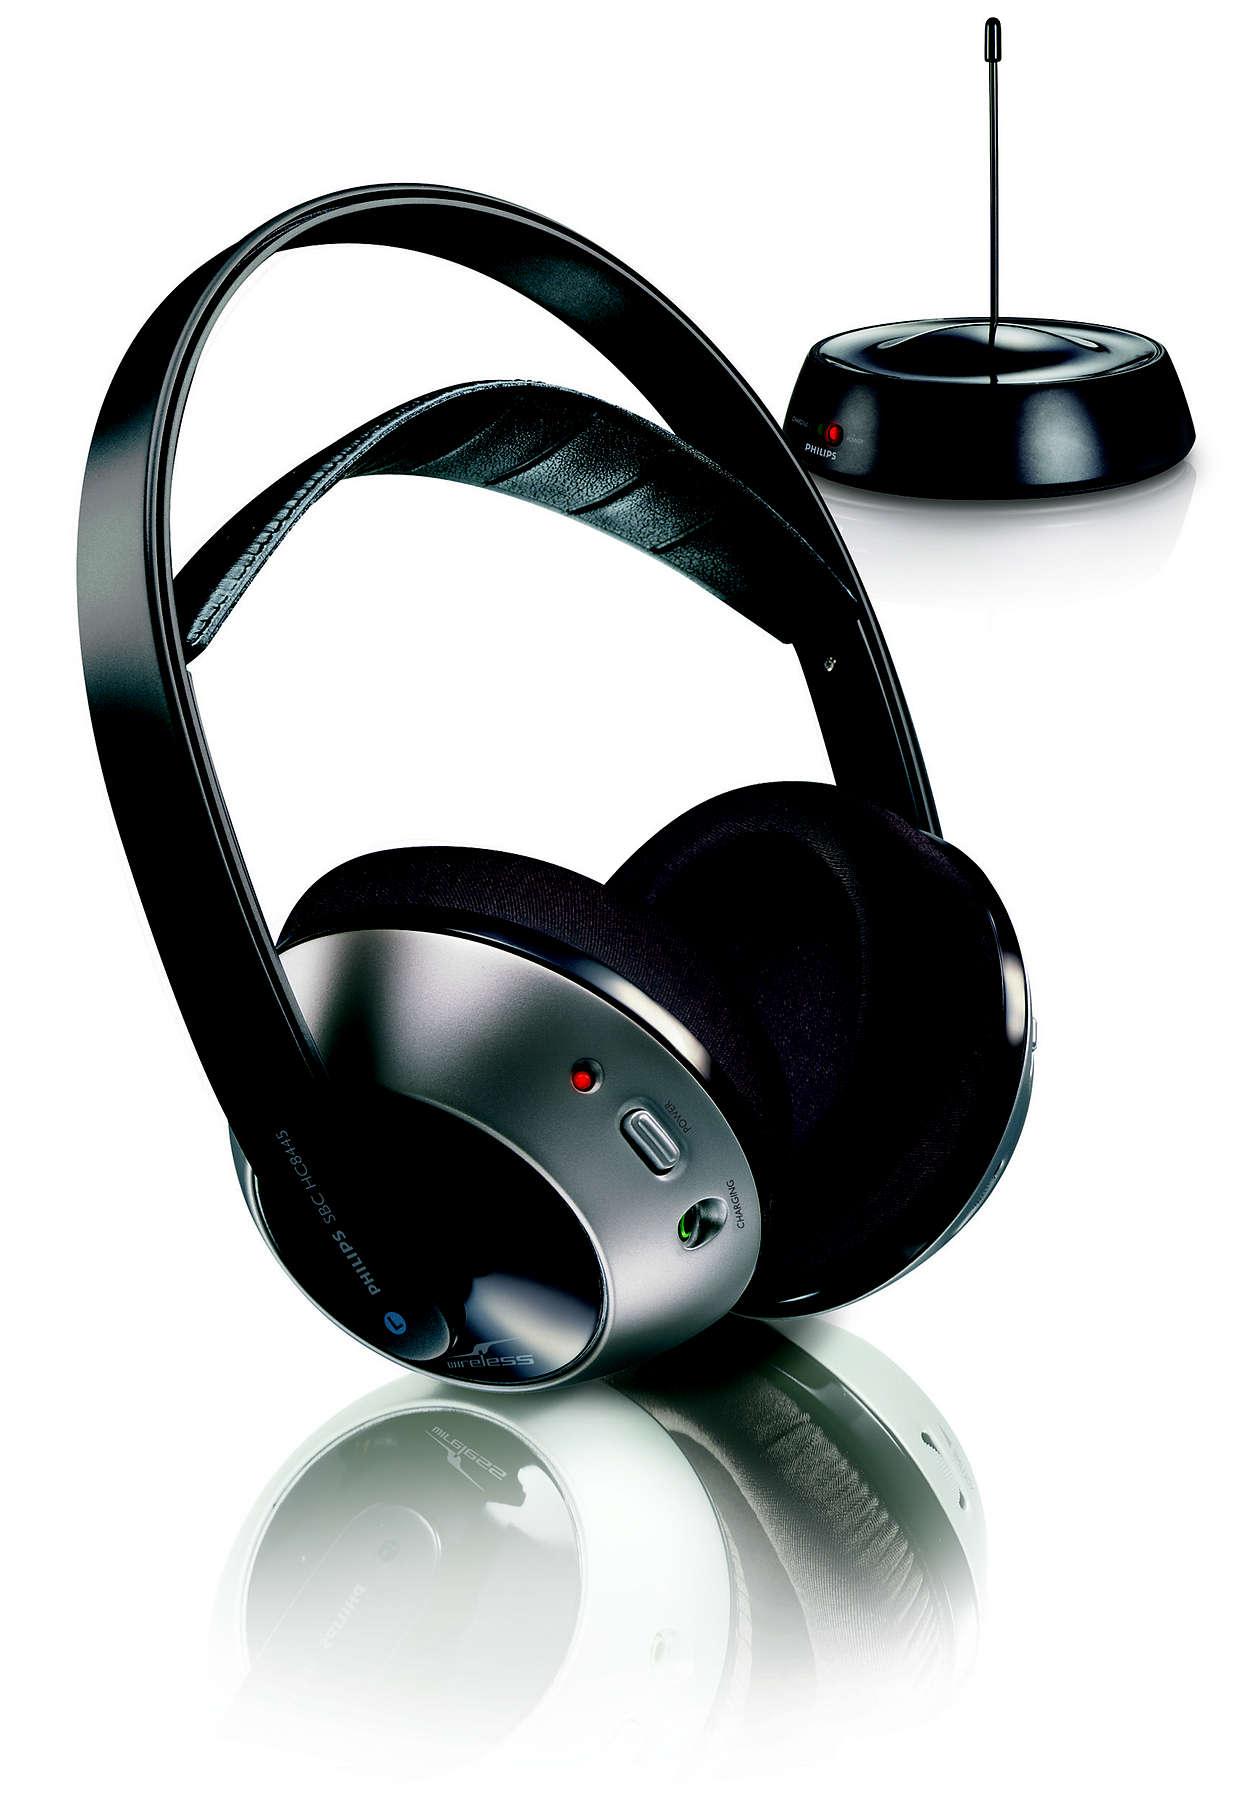 Wireless music